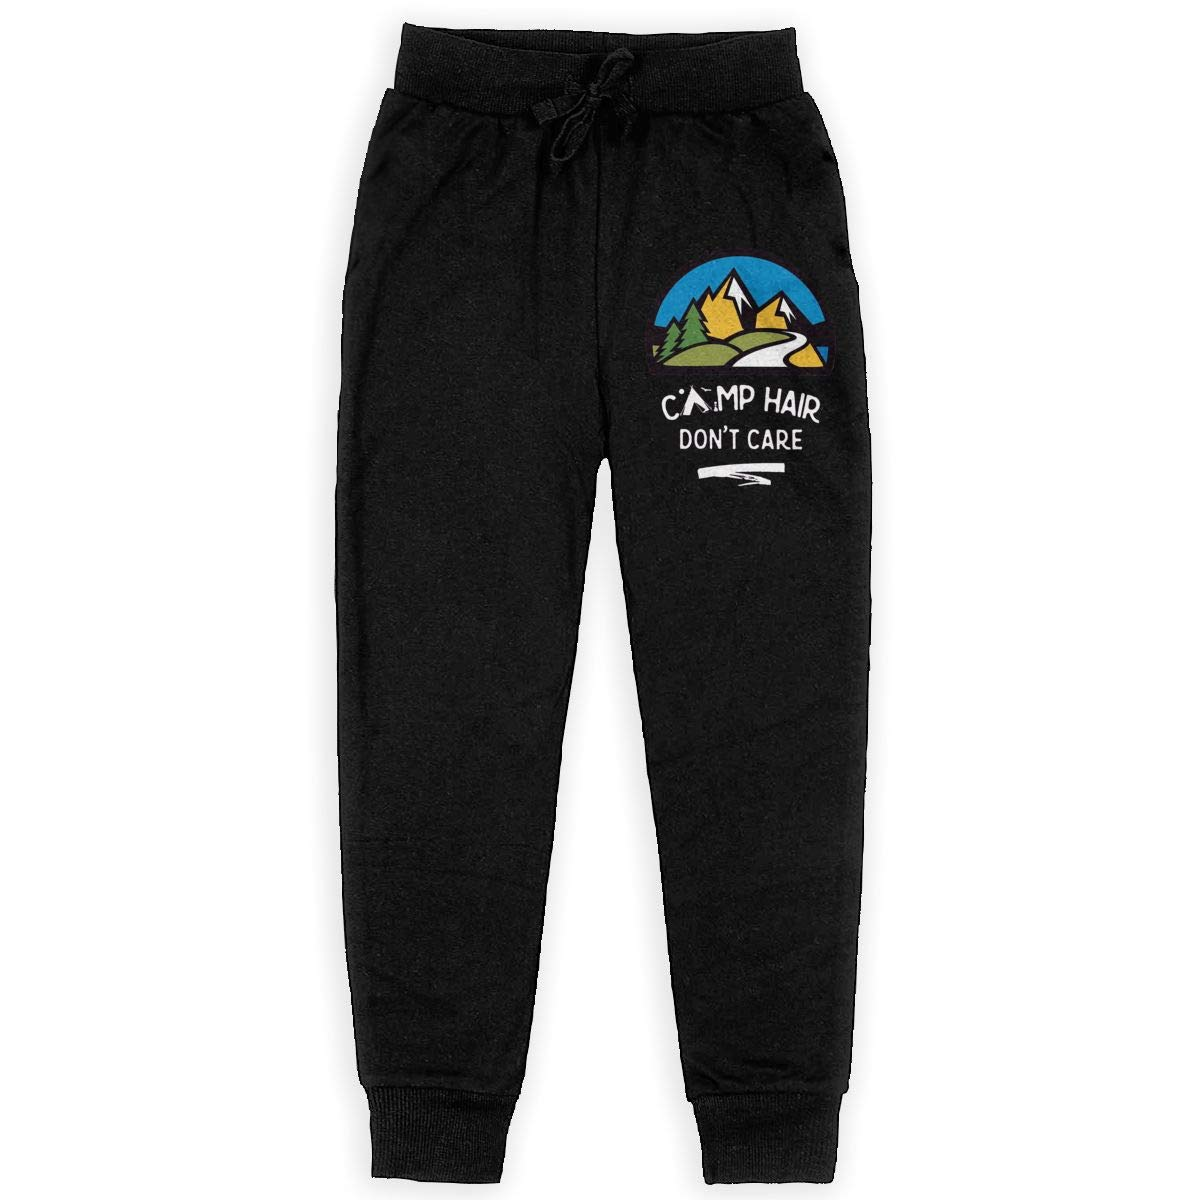 MatthewConnersw Teenage Camping Hair Dont Care Teen Sweatpants Active Fleece Jogger Back Pocket Black